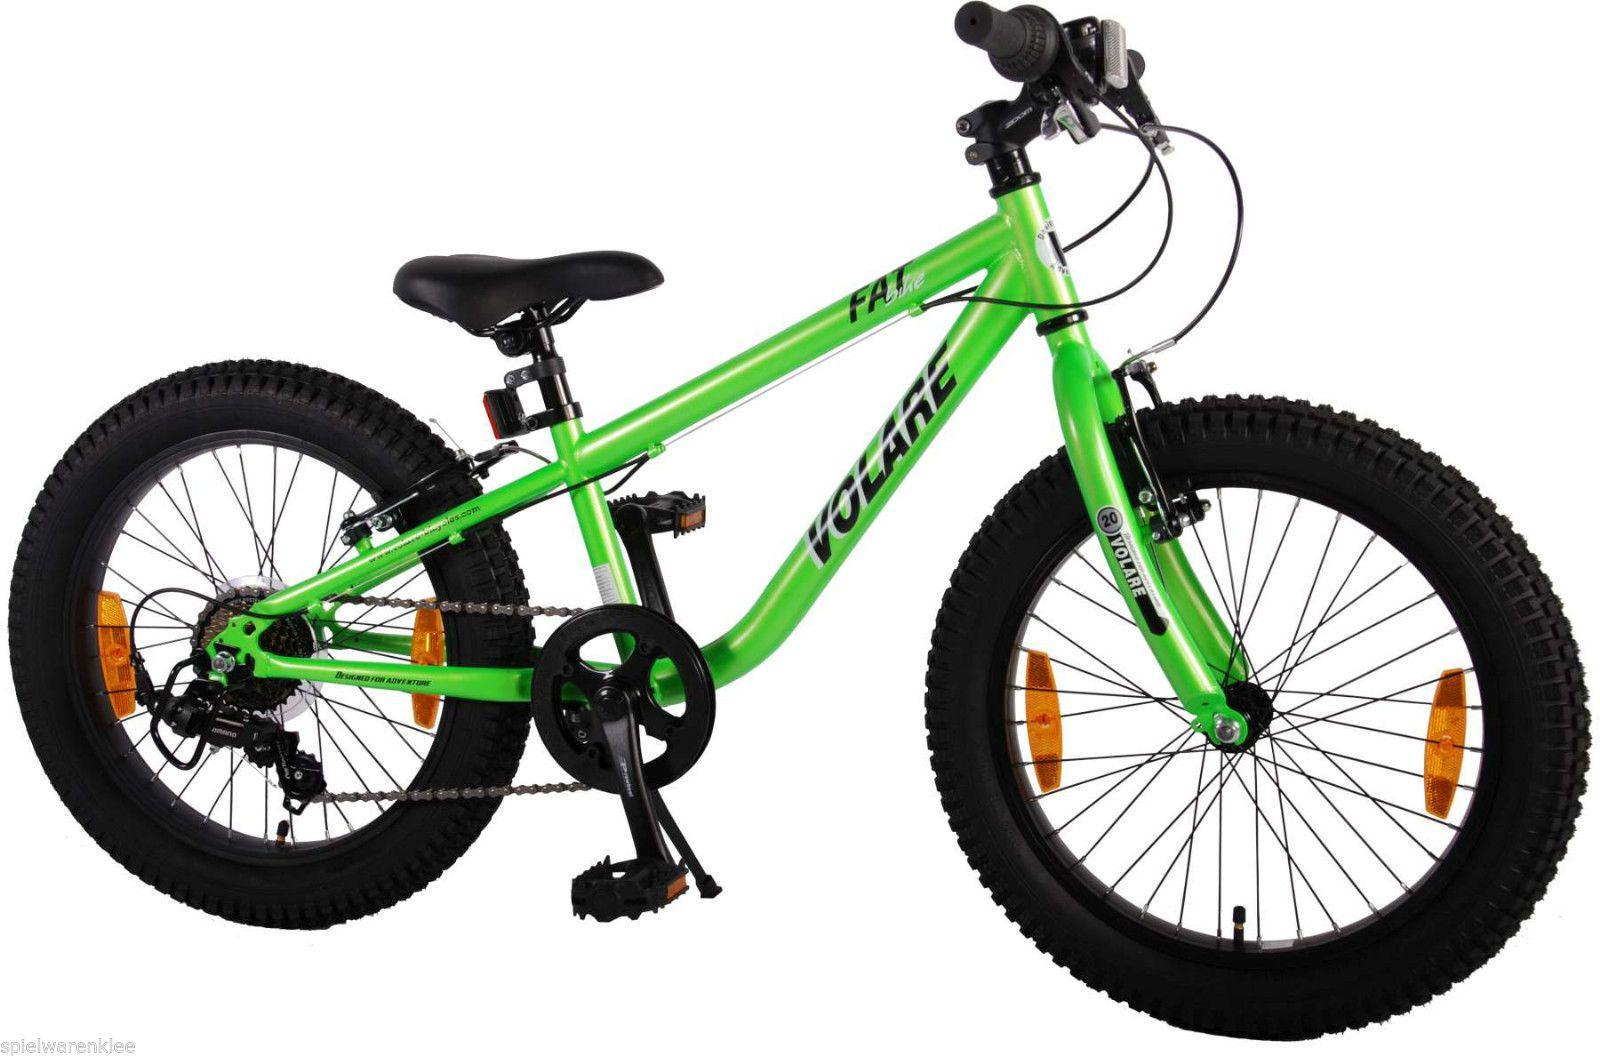 Ebay Angebot 20 Zoll Fahrrad Fat Bike Kinderfahrrad Mountainbike Shimano 7 Gang 62026ihr Quickberater Quickberater Kinderfahrrad Kinder Fahrrad Und 20 Zol